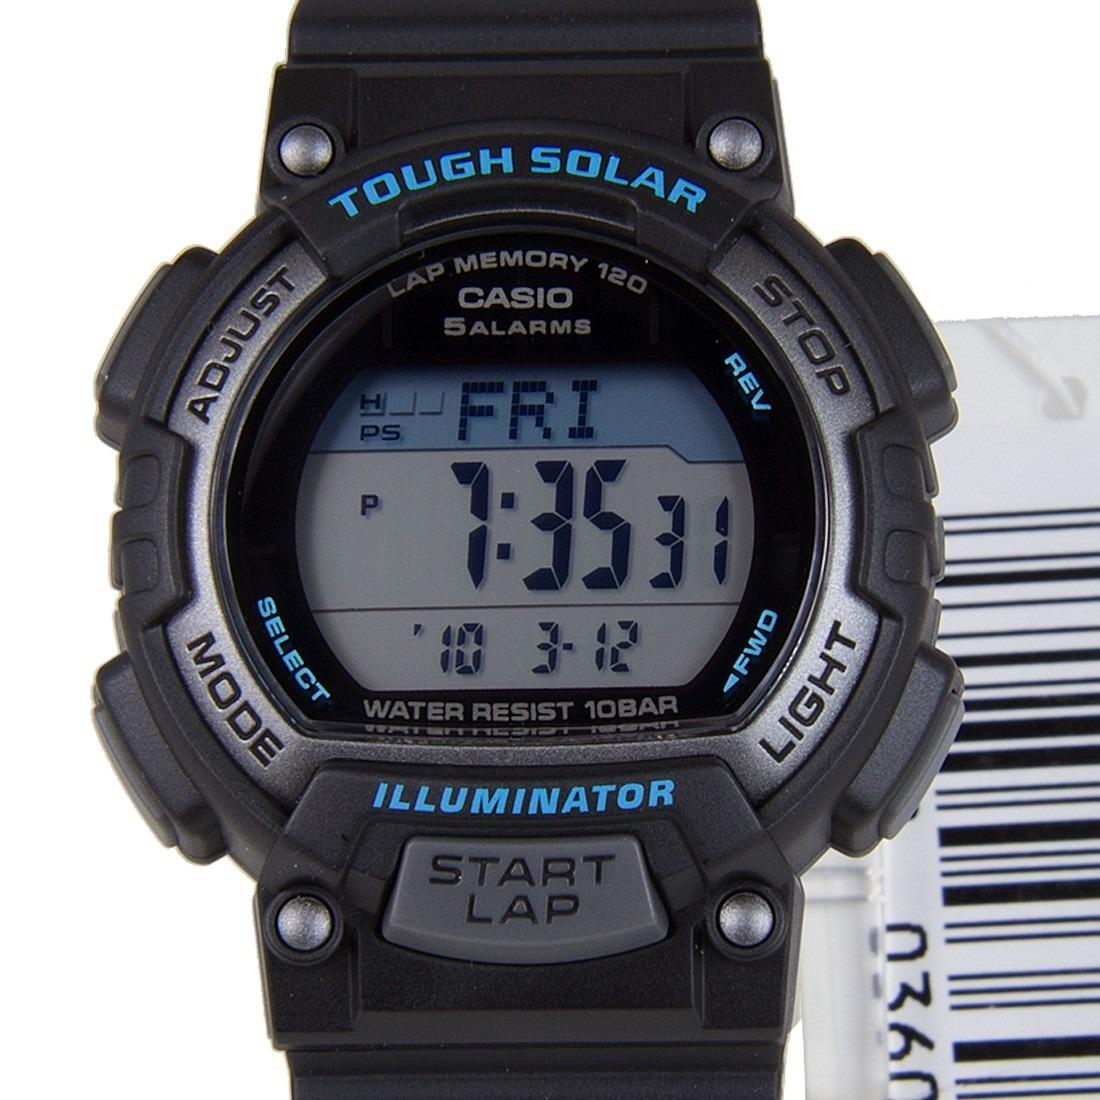 009e137f8d6f Reloj Casio Phys Stl-s300 Dama Sport Energía Solar -   819.00 en ...